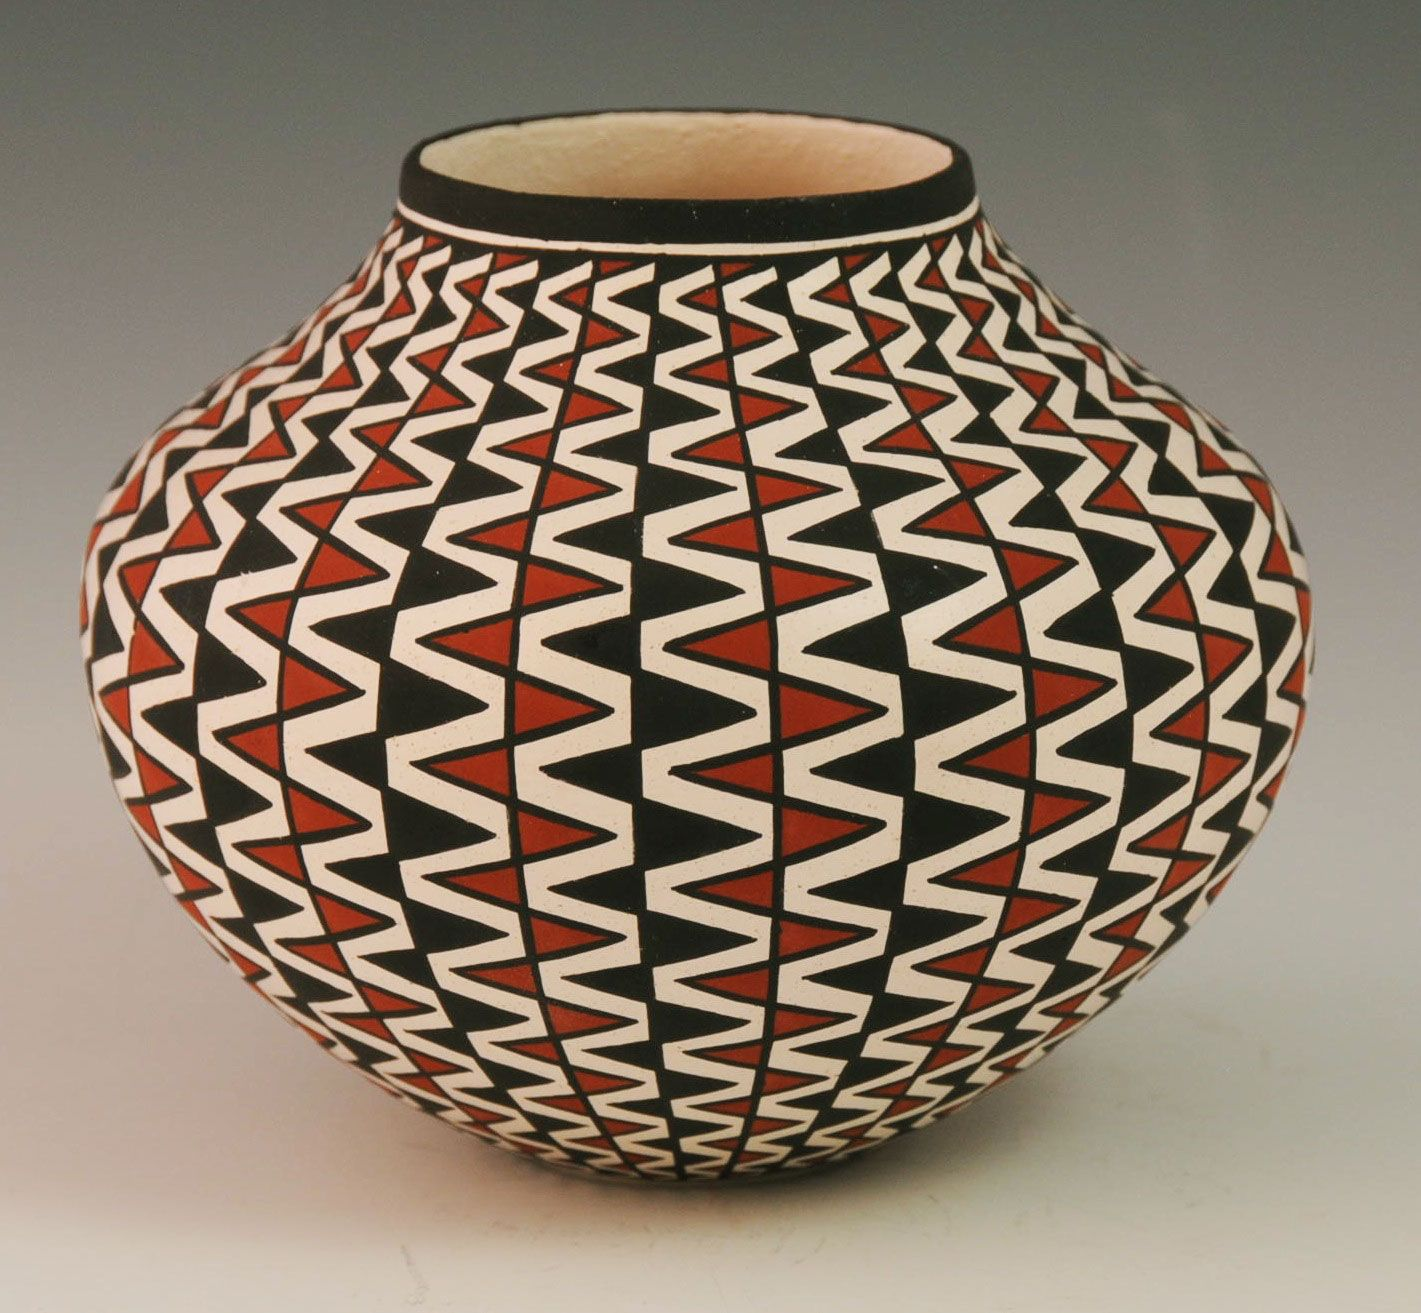 Paula estevan acoma moderne muster keramik moderne - Moderne muster ...